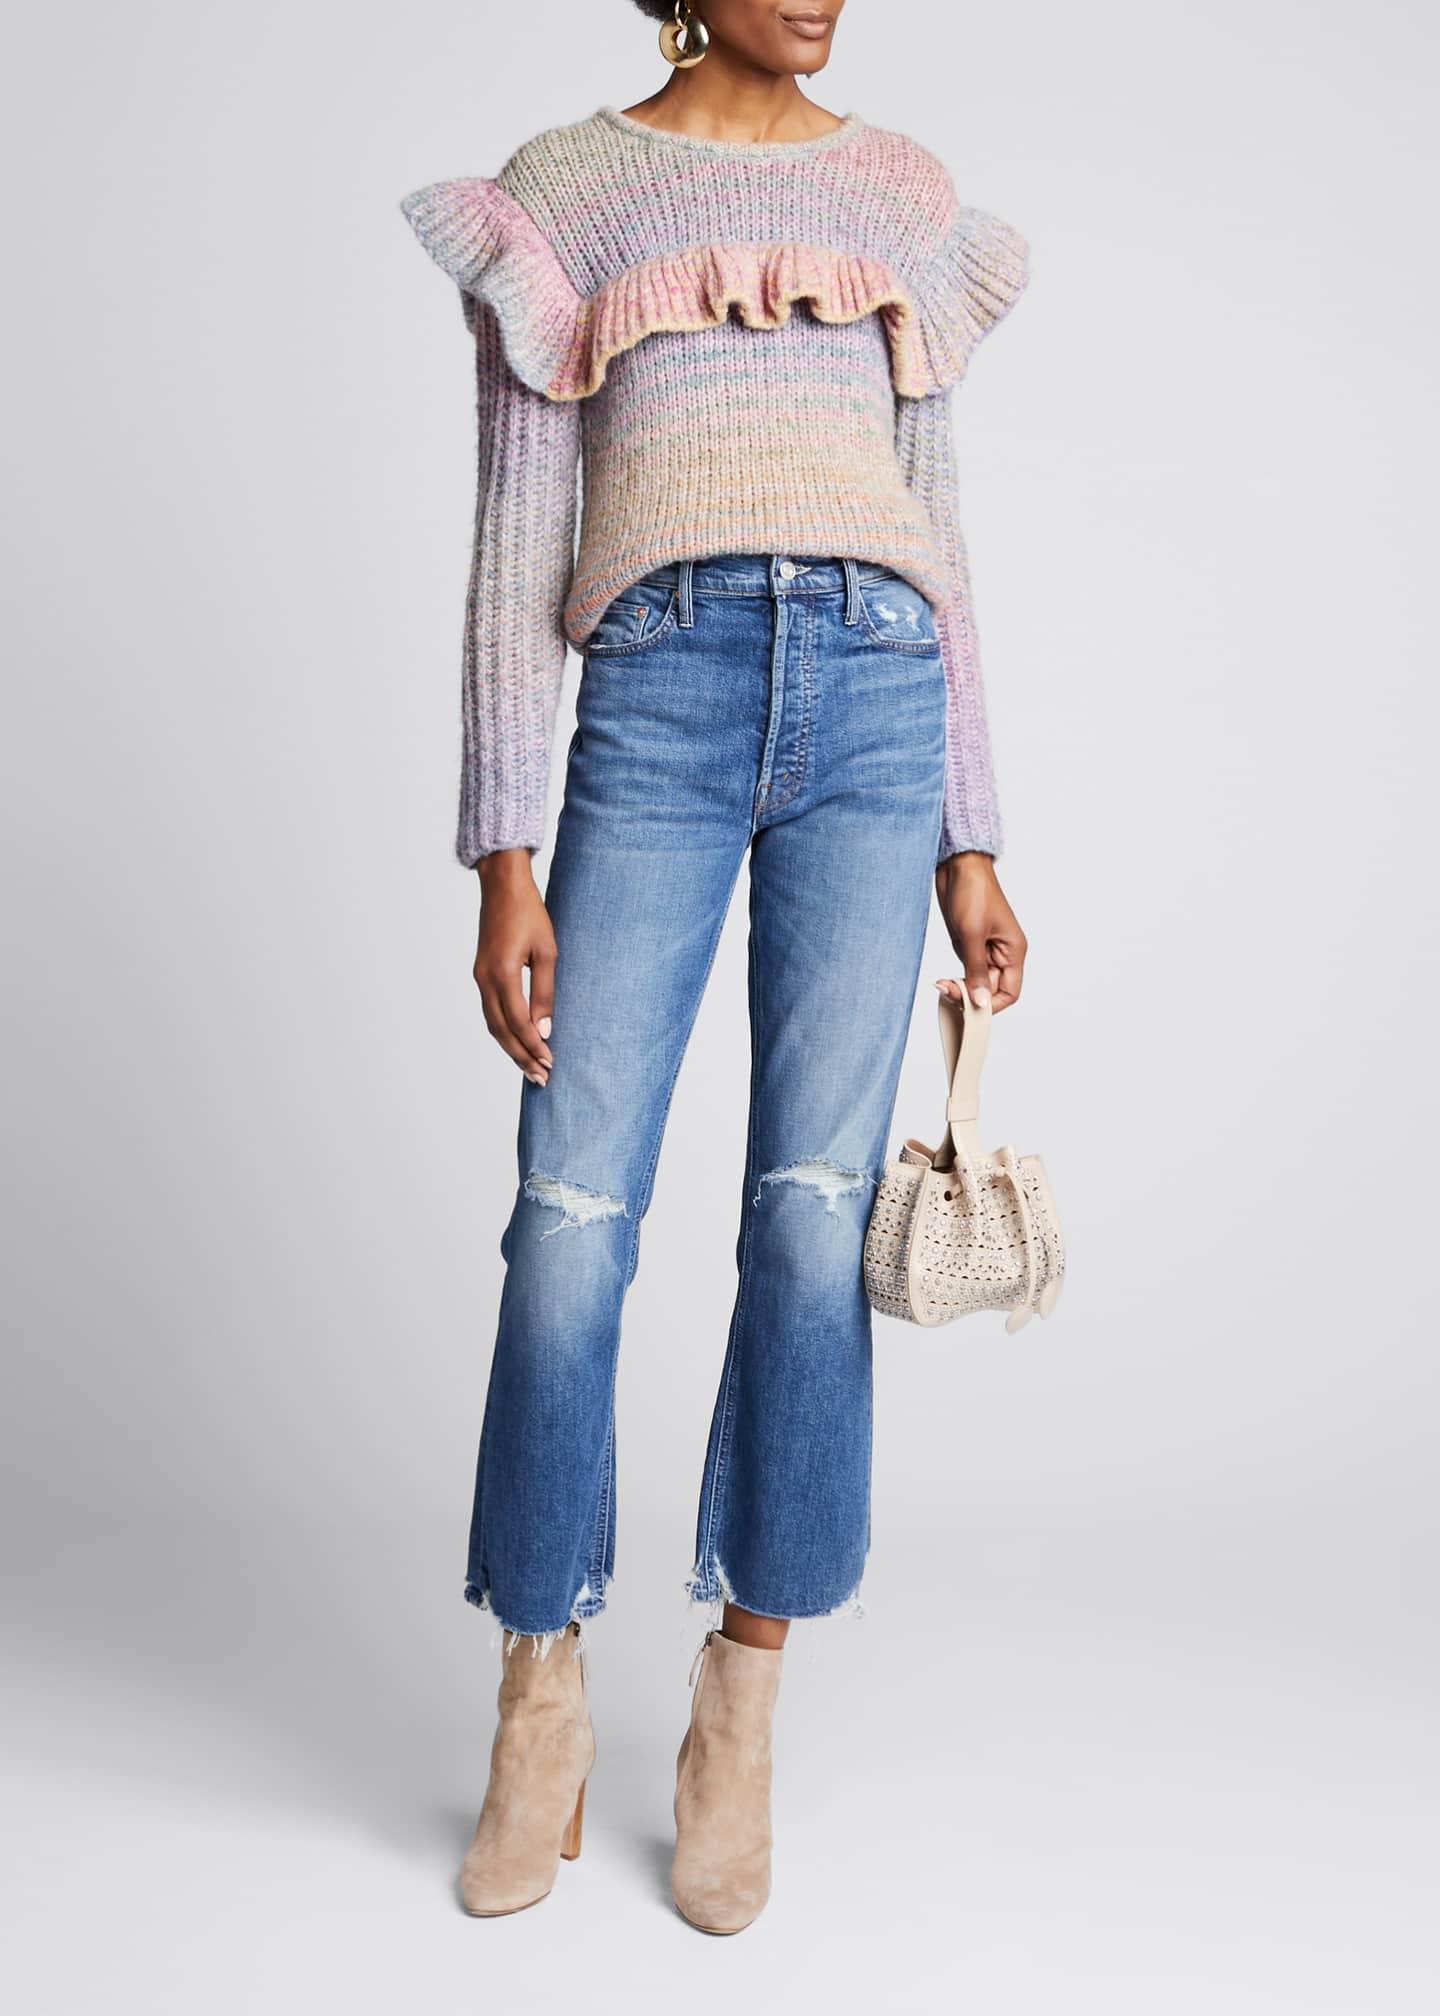 LoveShackFancy Yumi Ruffle Long-Sleeve Pullover Sweater